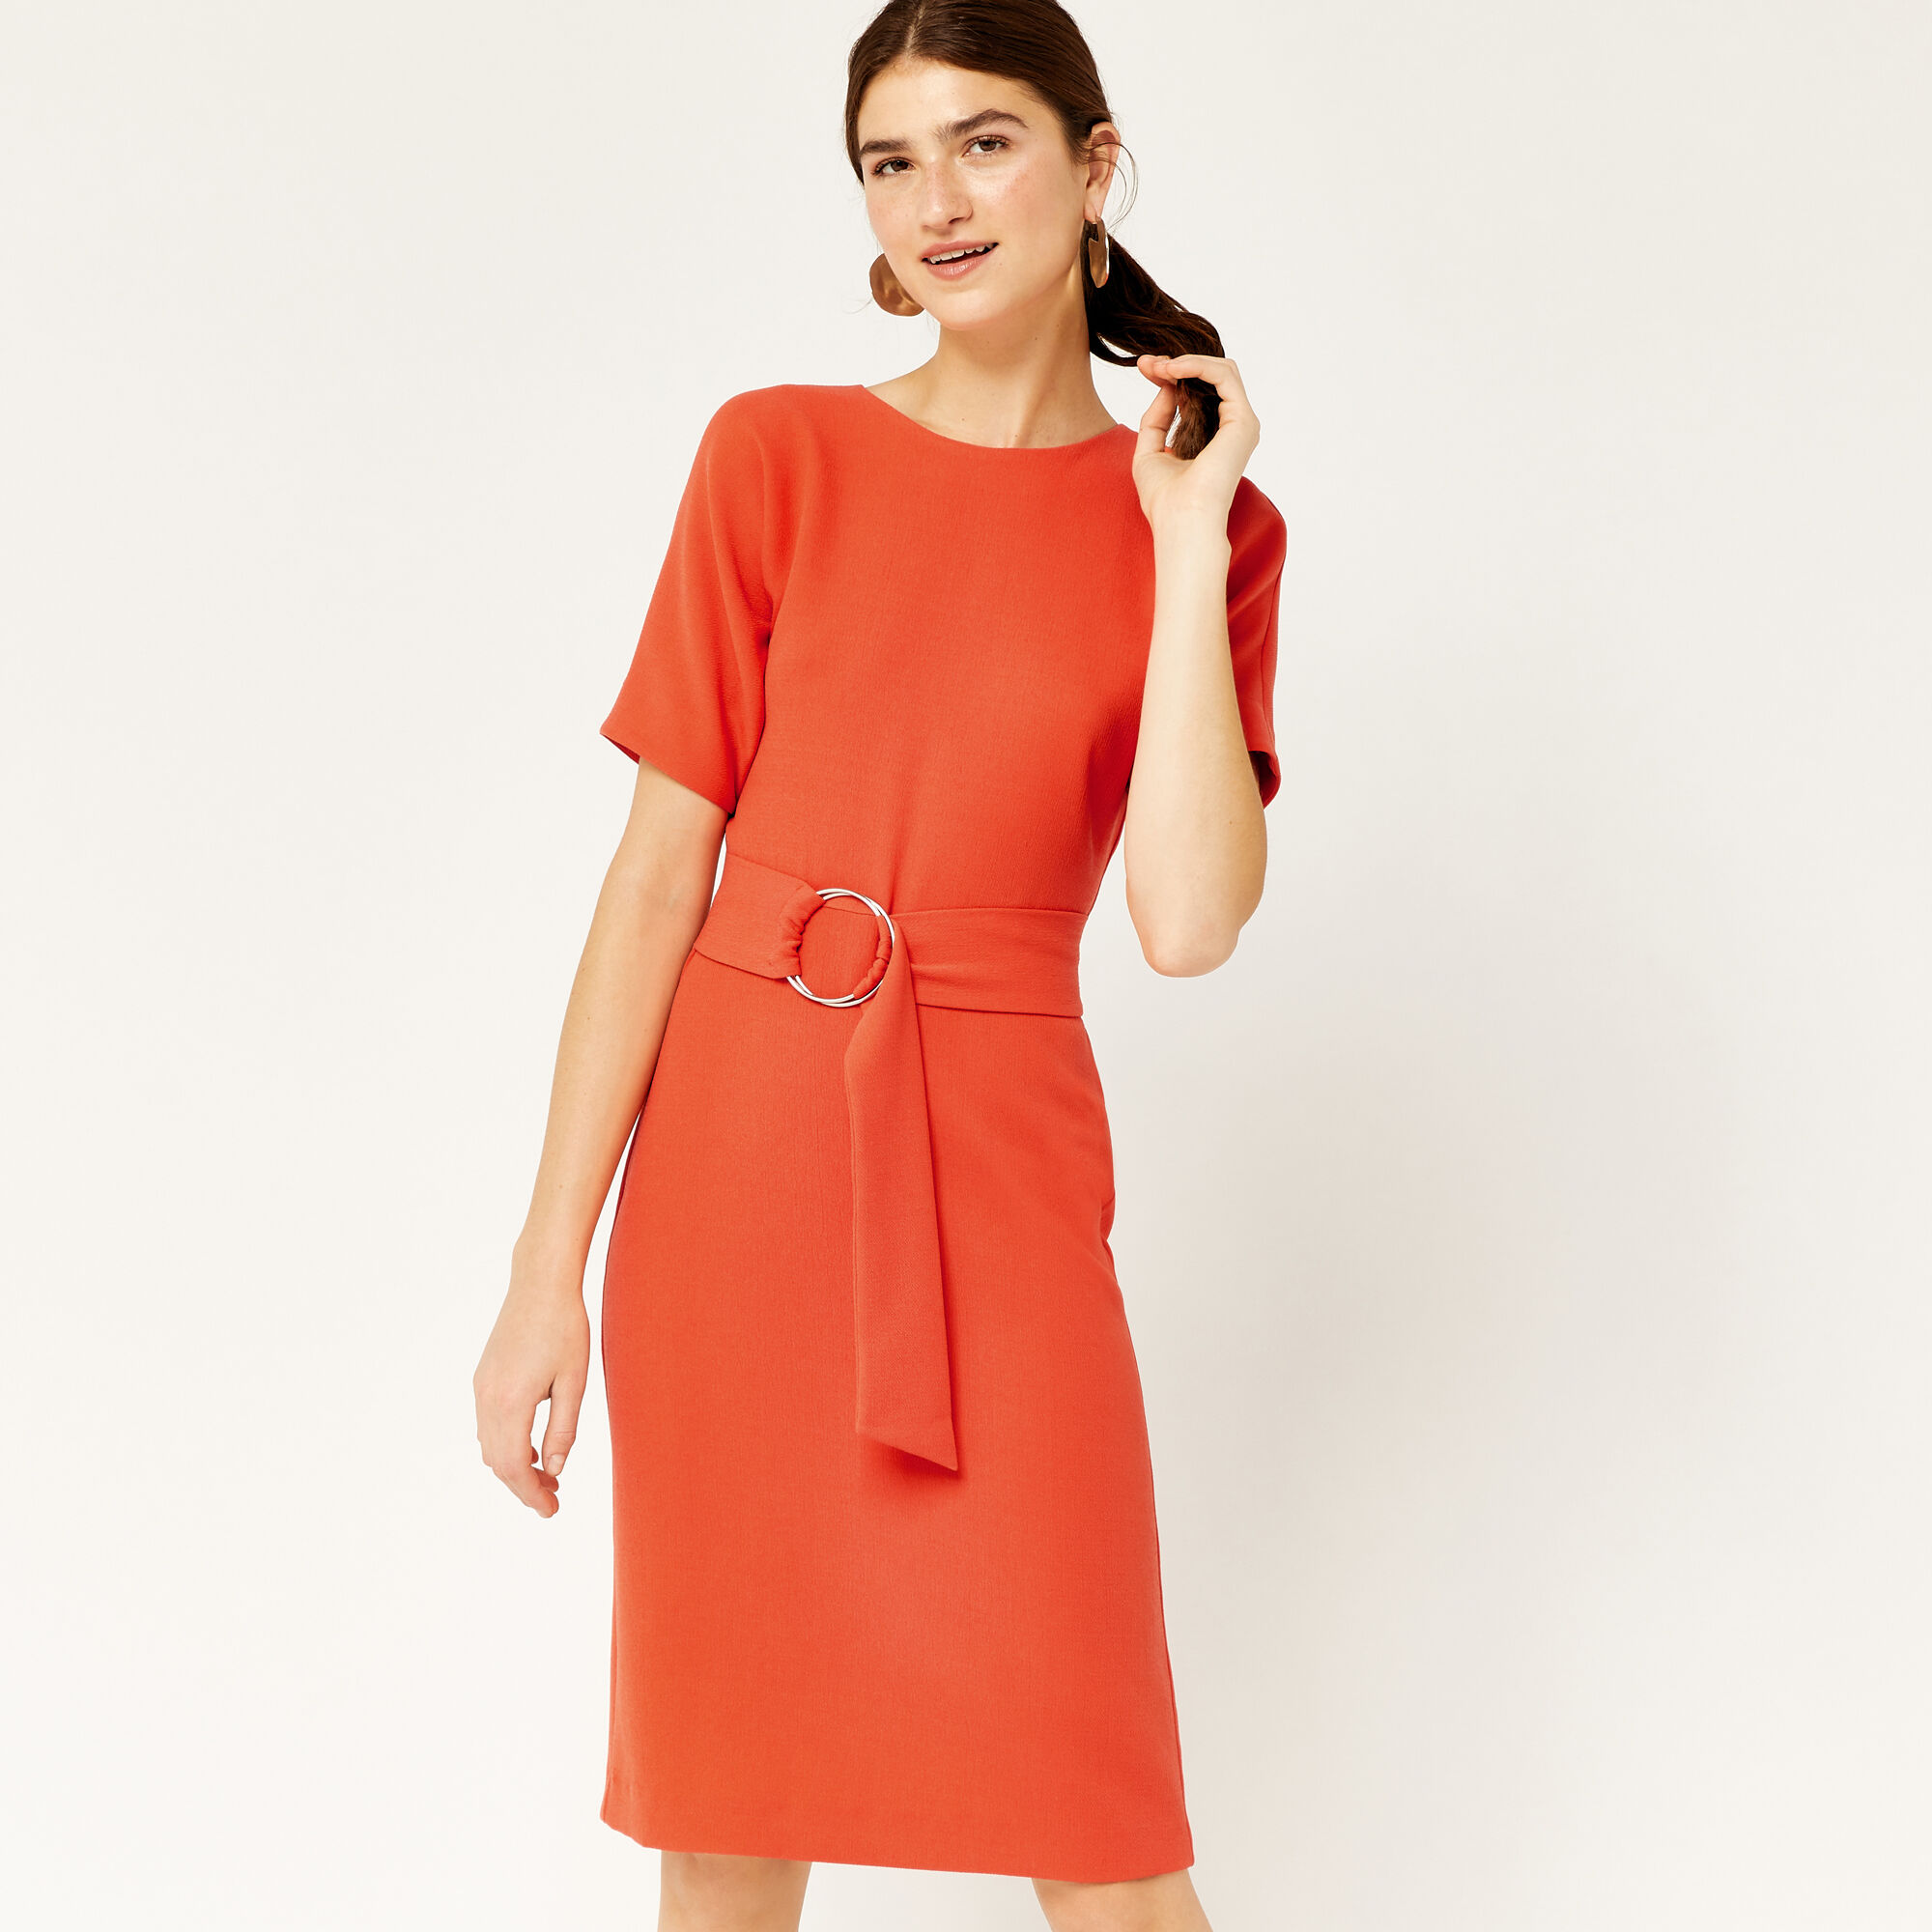 Warehouse, O RING DRESS Orange 1